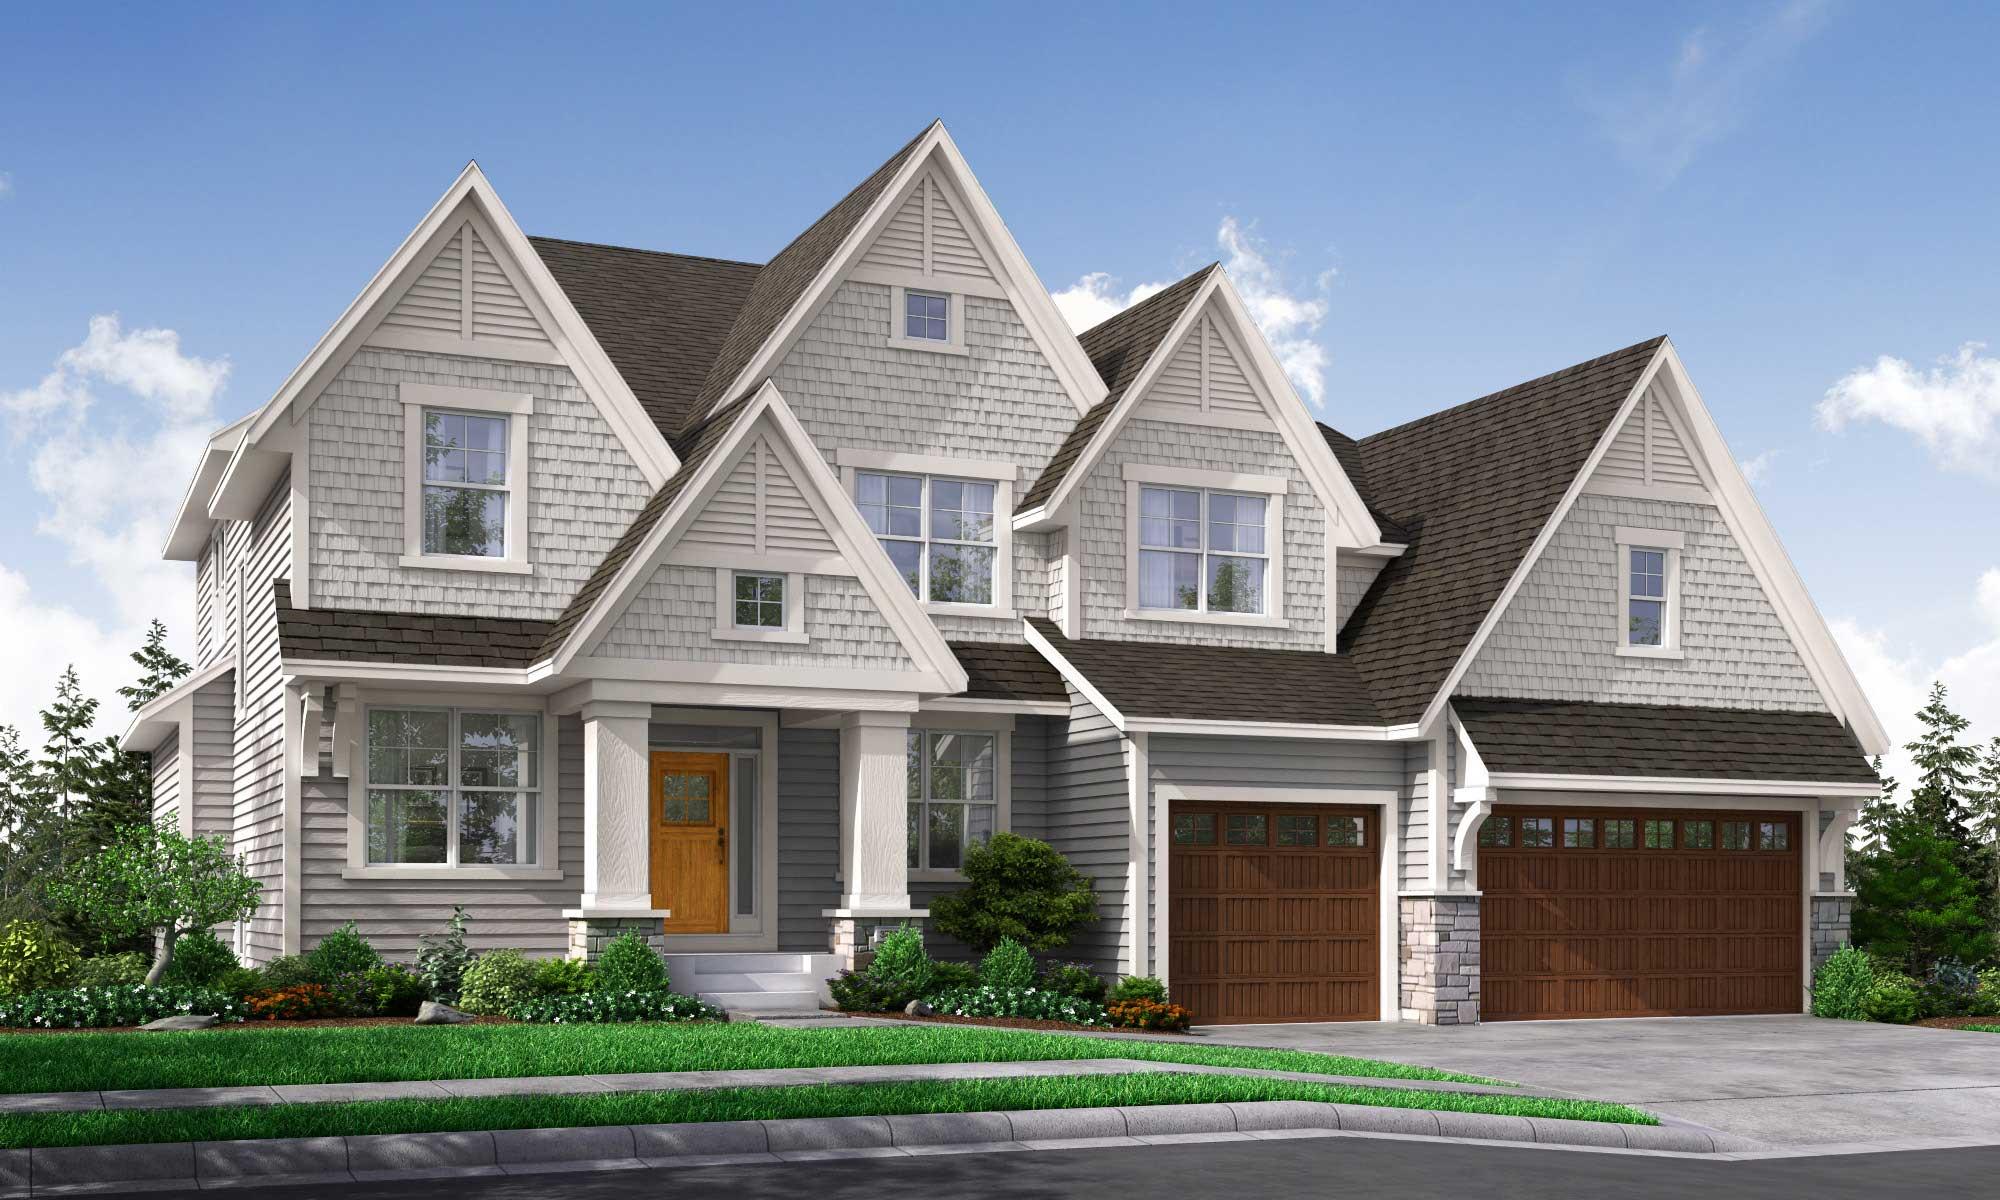 Exterior rendering of home with Nokomis Elevation D design